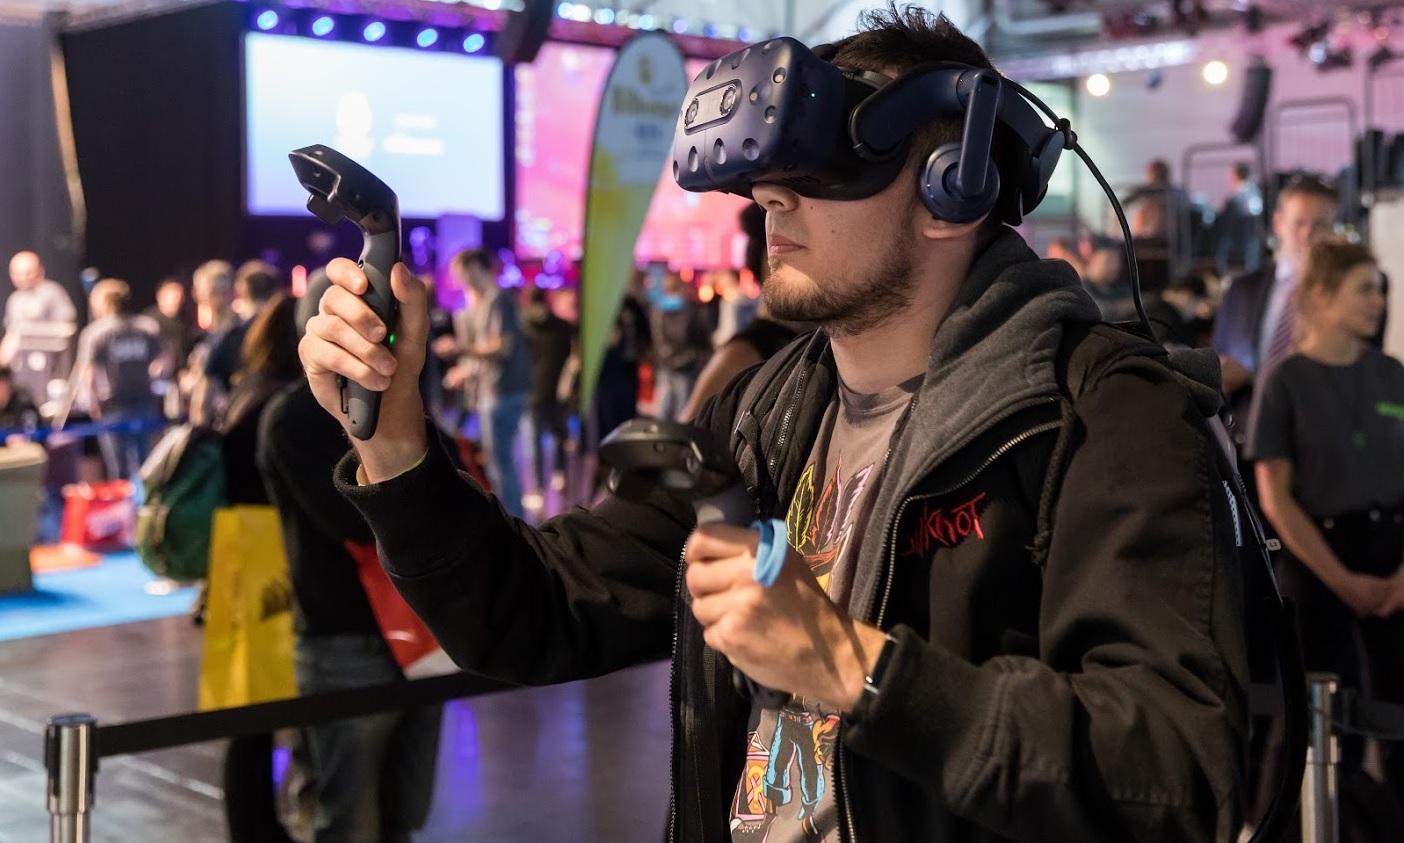 DreamHack Leipzig 2019 VIVE Pro